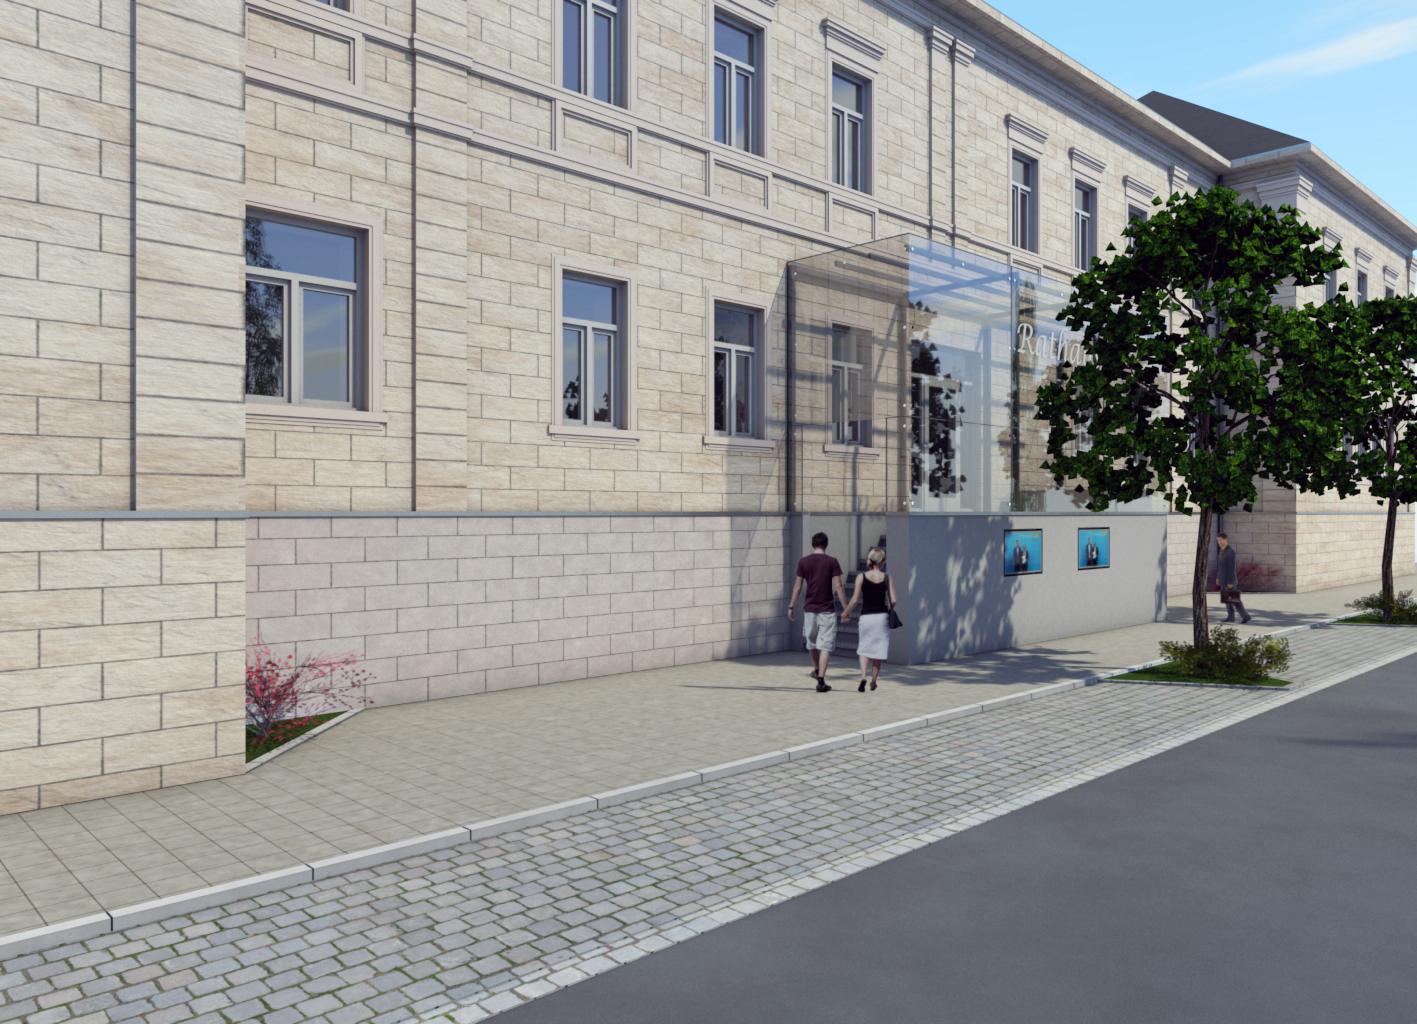 Barrierefreier Zugang Rathaus Bad Berneck - Treppe